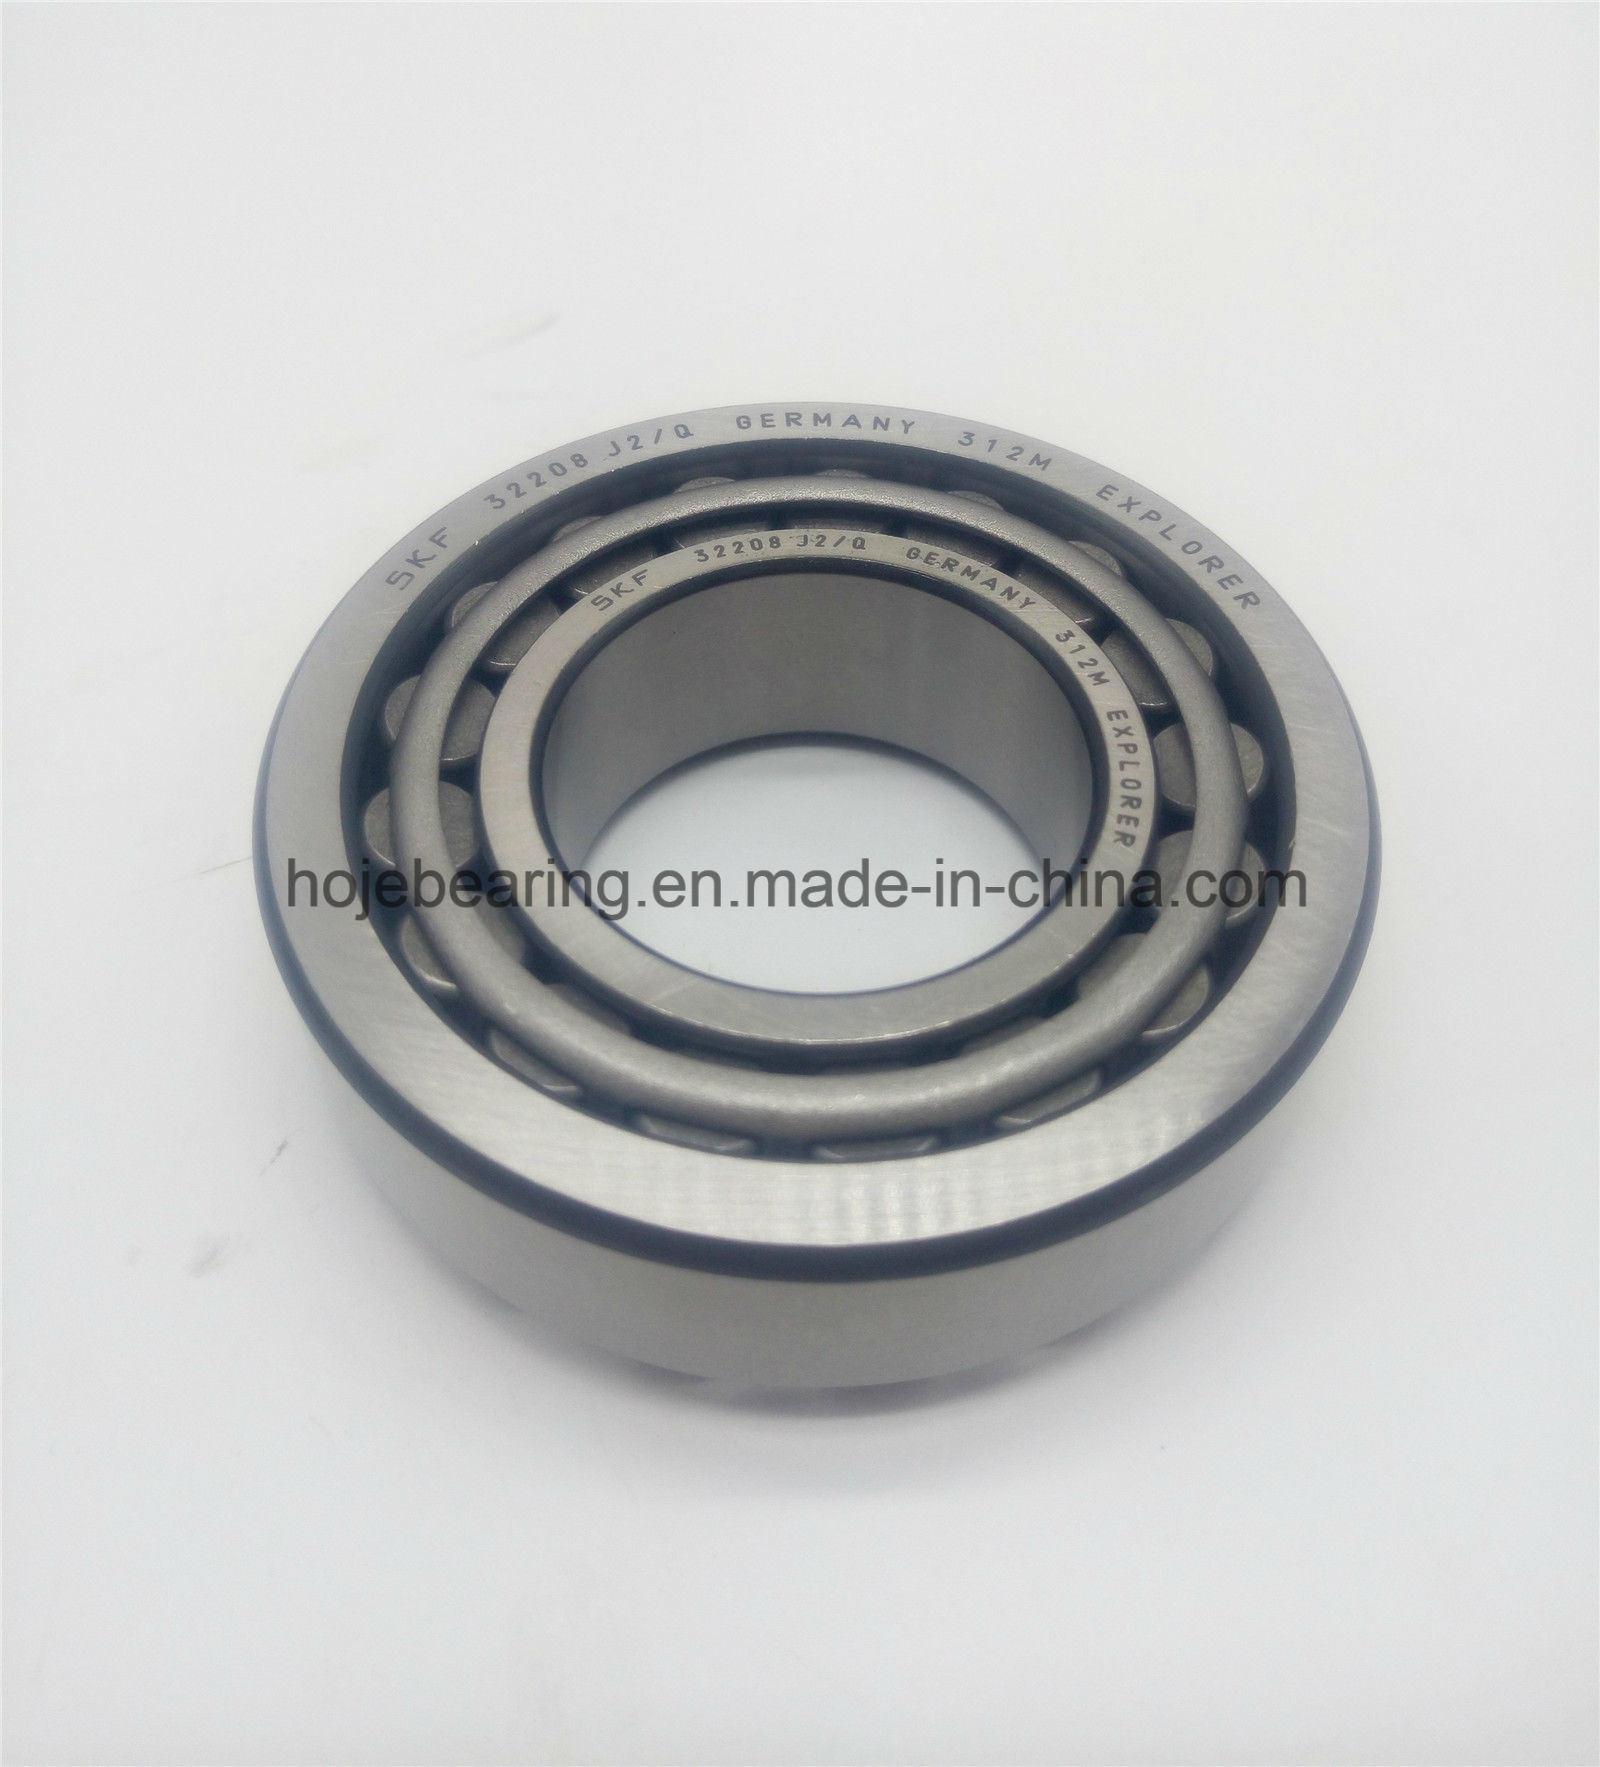 China Factory Taper Roller Bearing 31310 32310 Automotive Bearing